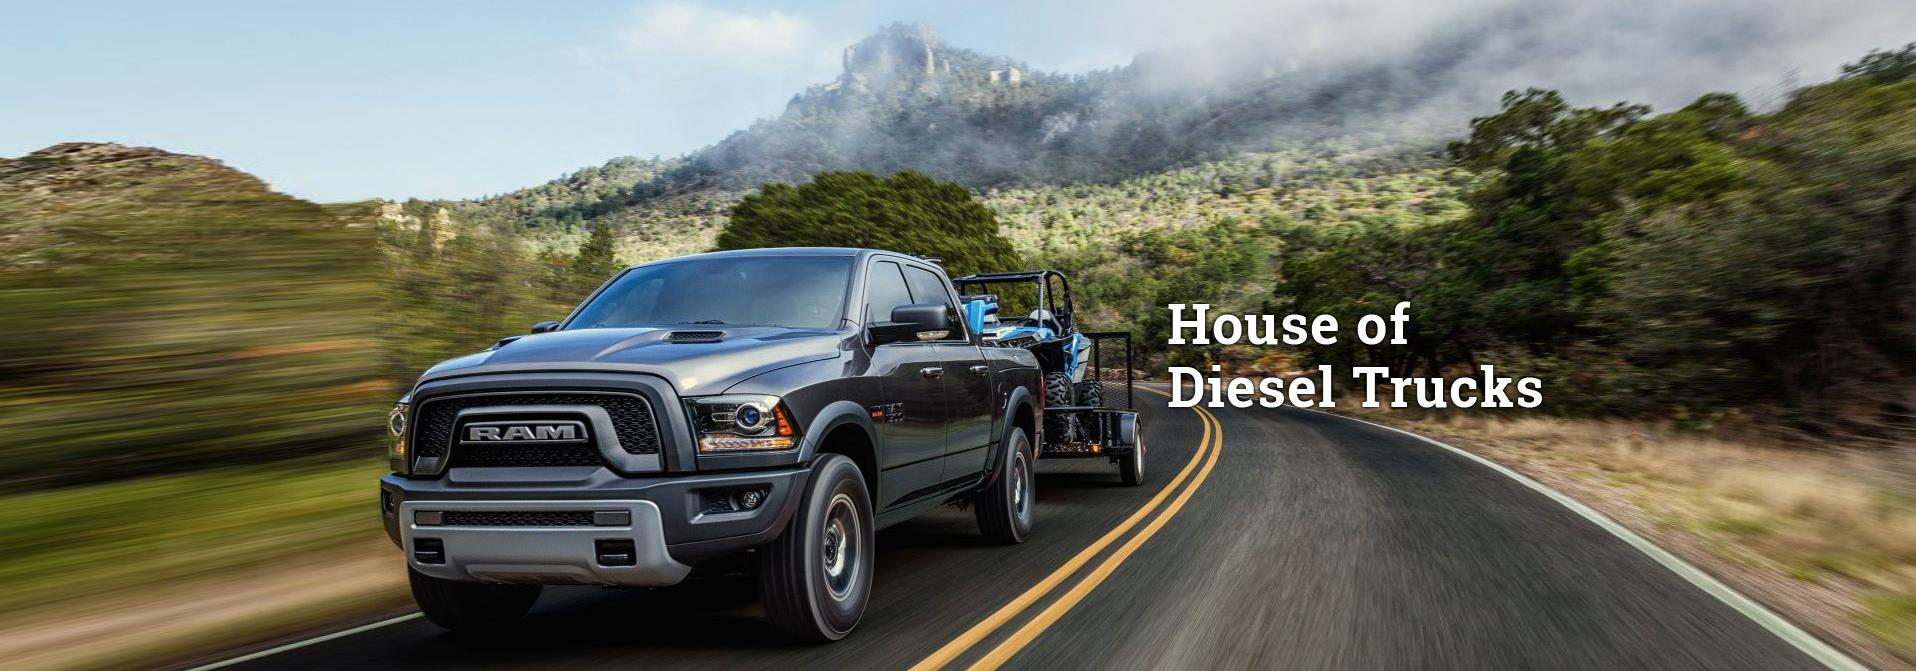 LV Cars Auto Sales West Las Vegas NV   New & Used Cars Trucks ...